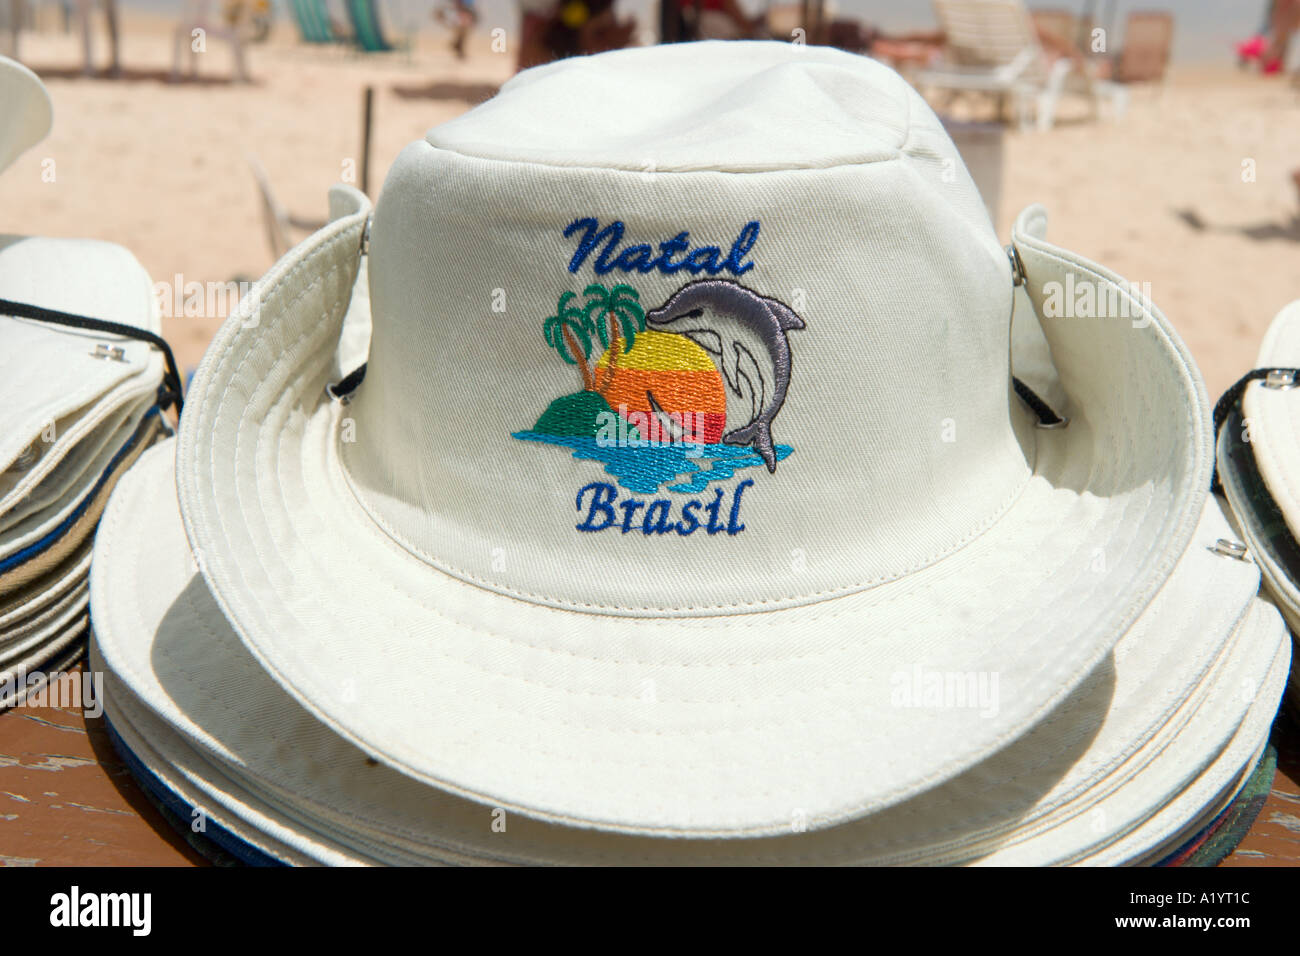 Hats for sale, Ponta Negra, Natal, Rio Grande do Norte, Brazil - Stock Image